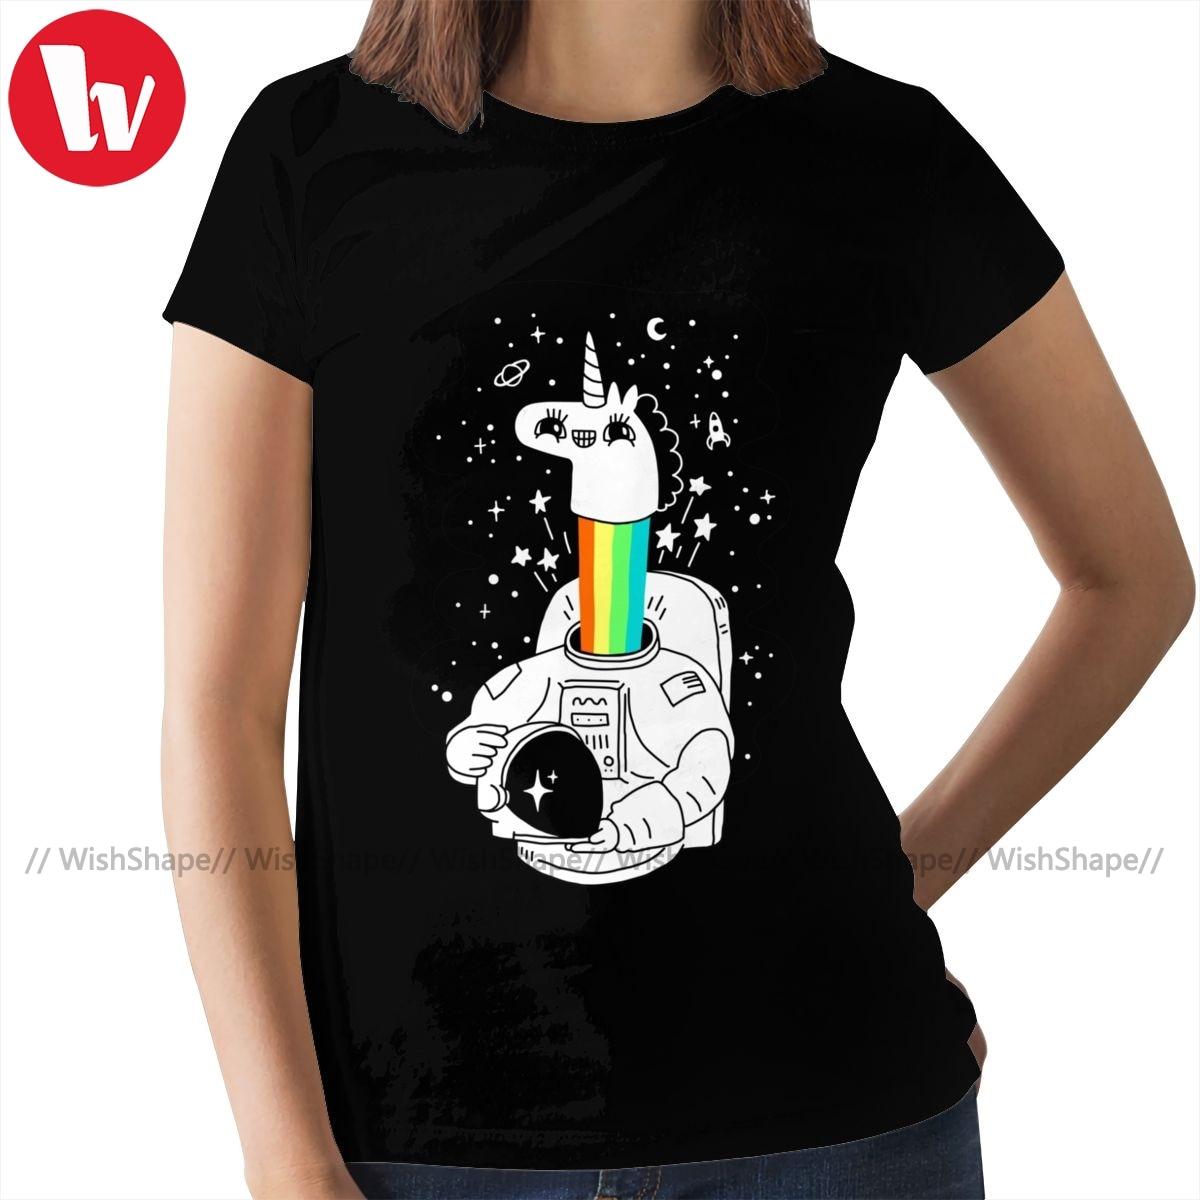 Camiseta Crazy Horse See You In Space, camiseta Simple de moda urbana para mujer, camiseta de gran tamaño para mujer